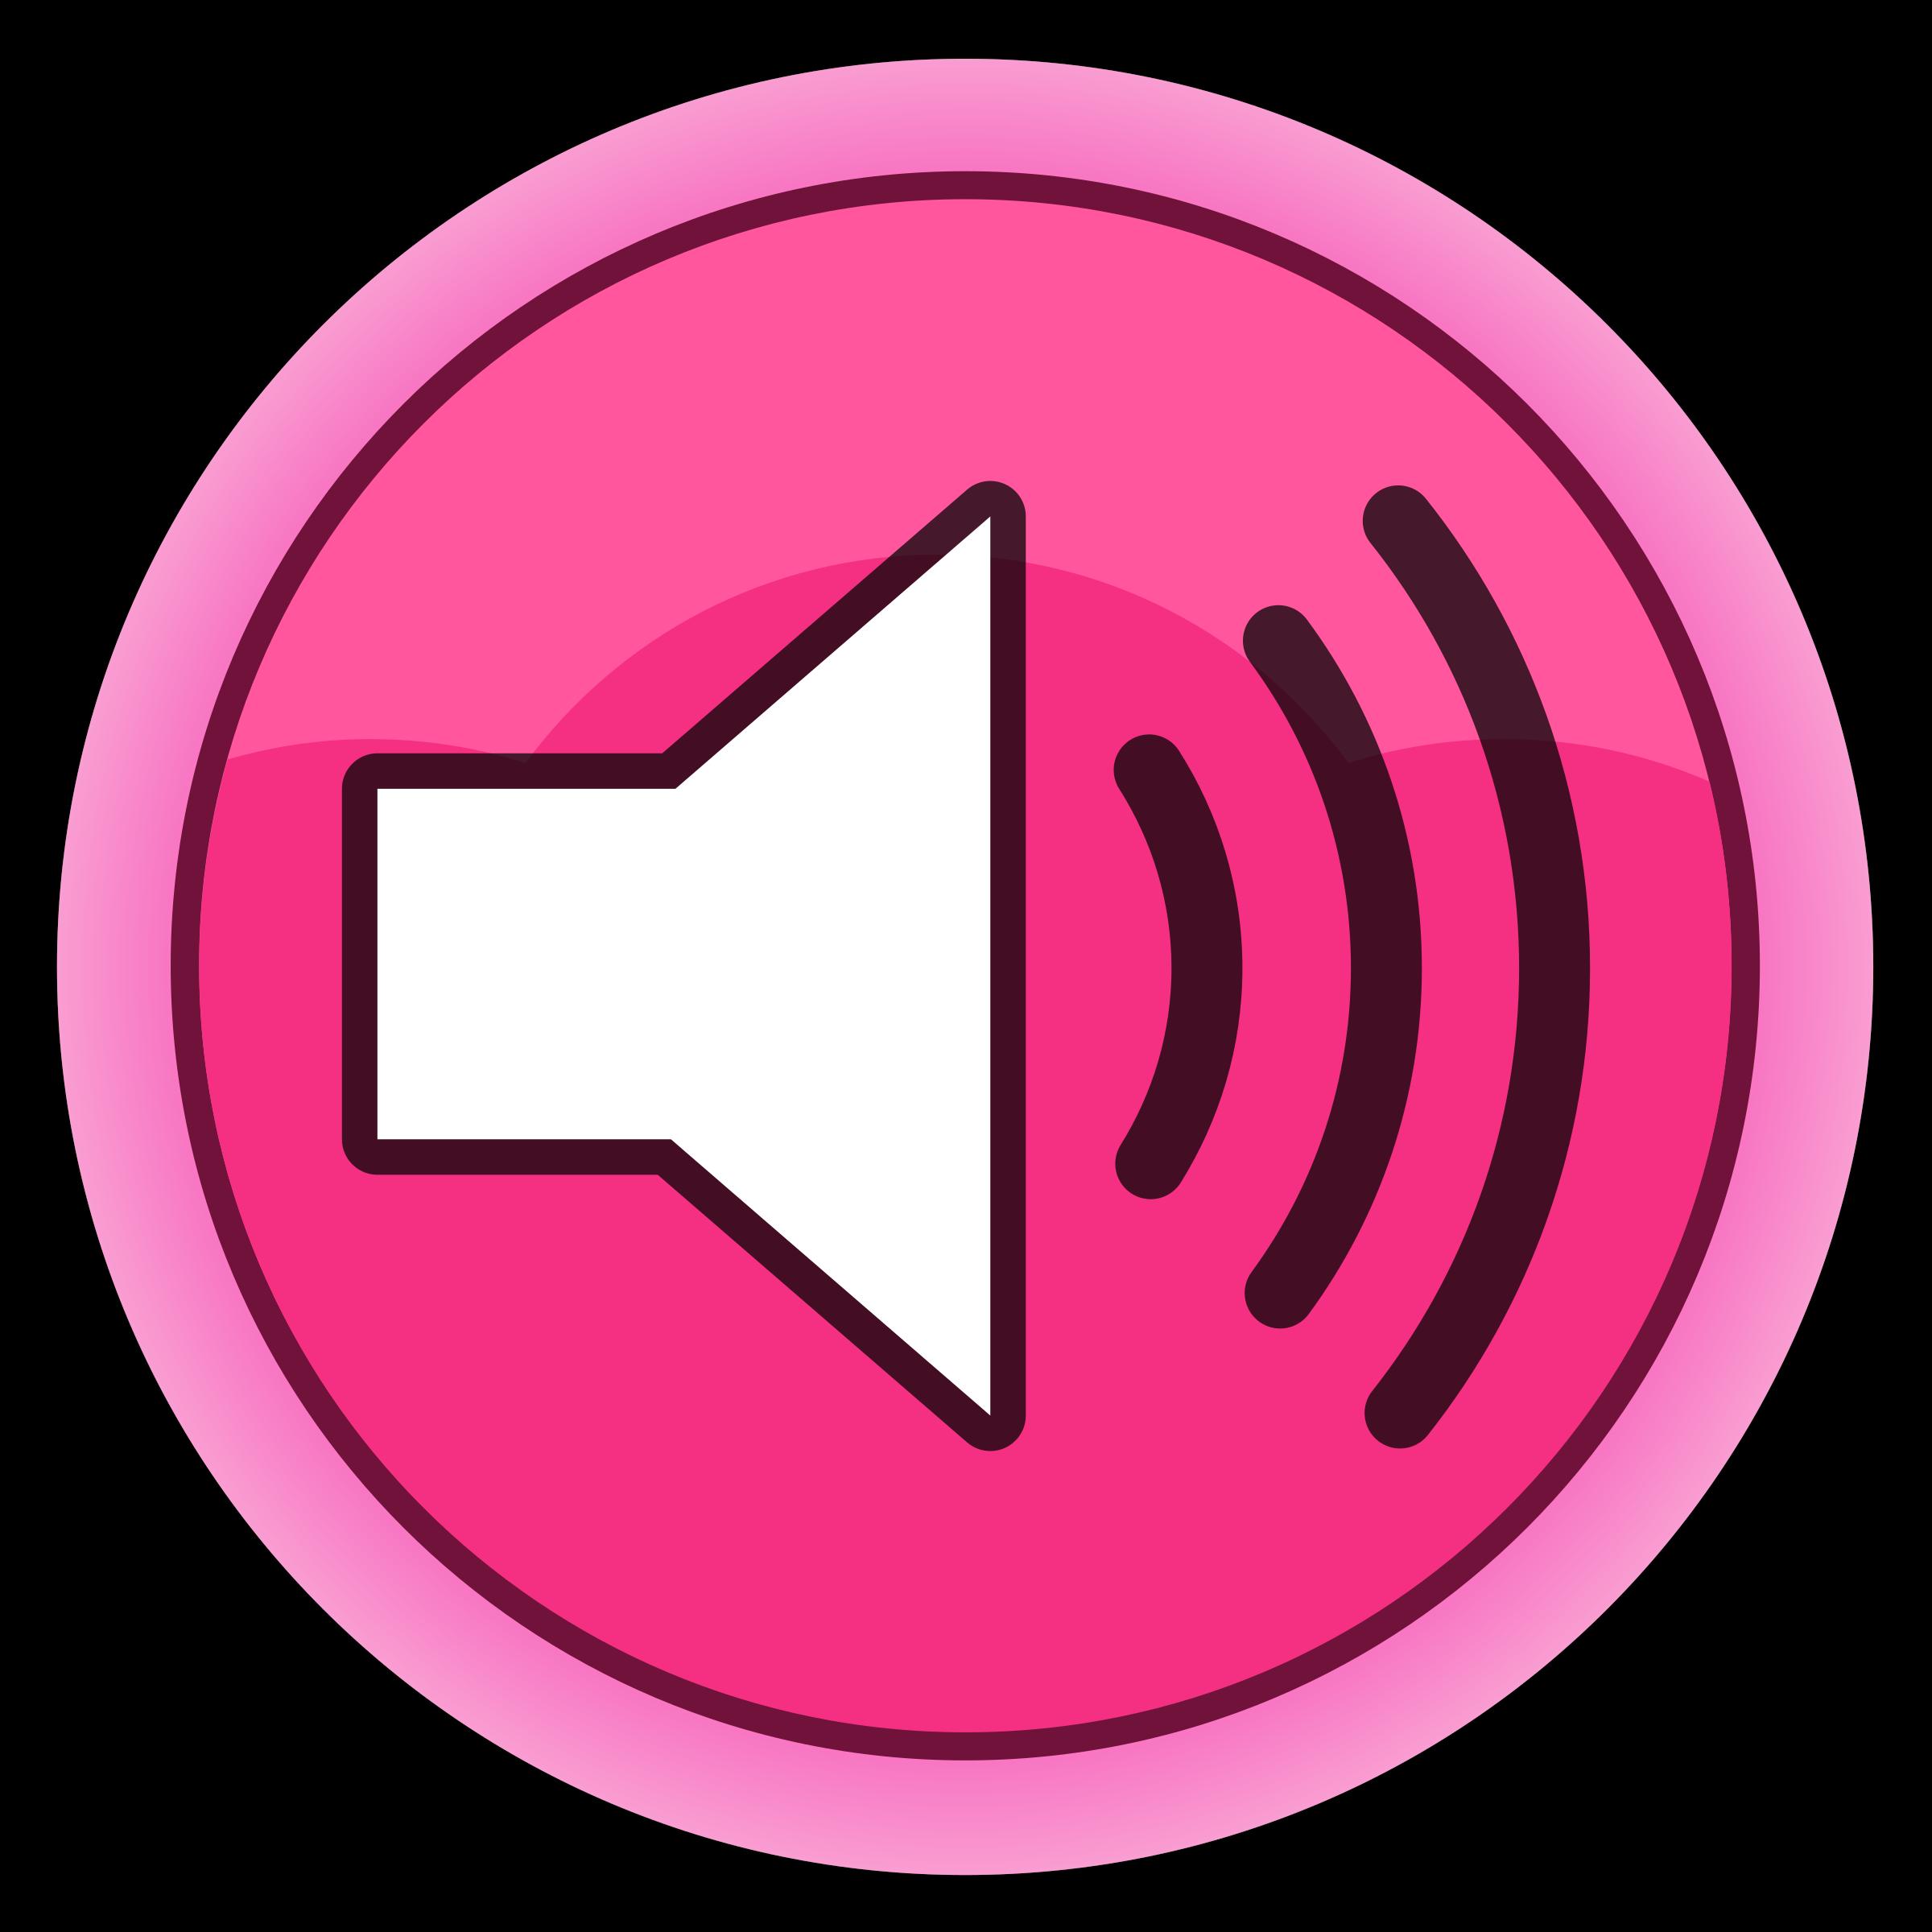 Sound Button Clipart.